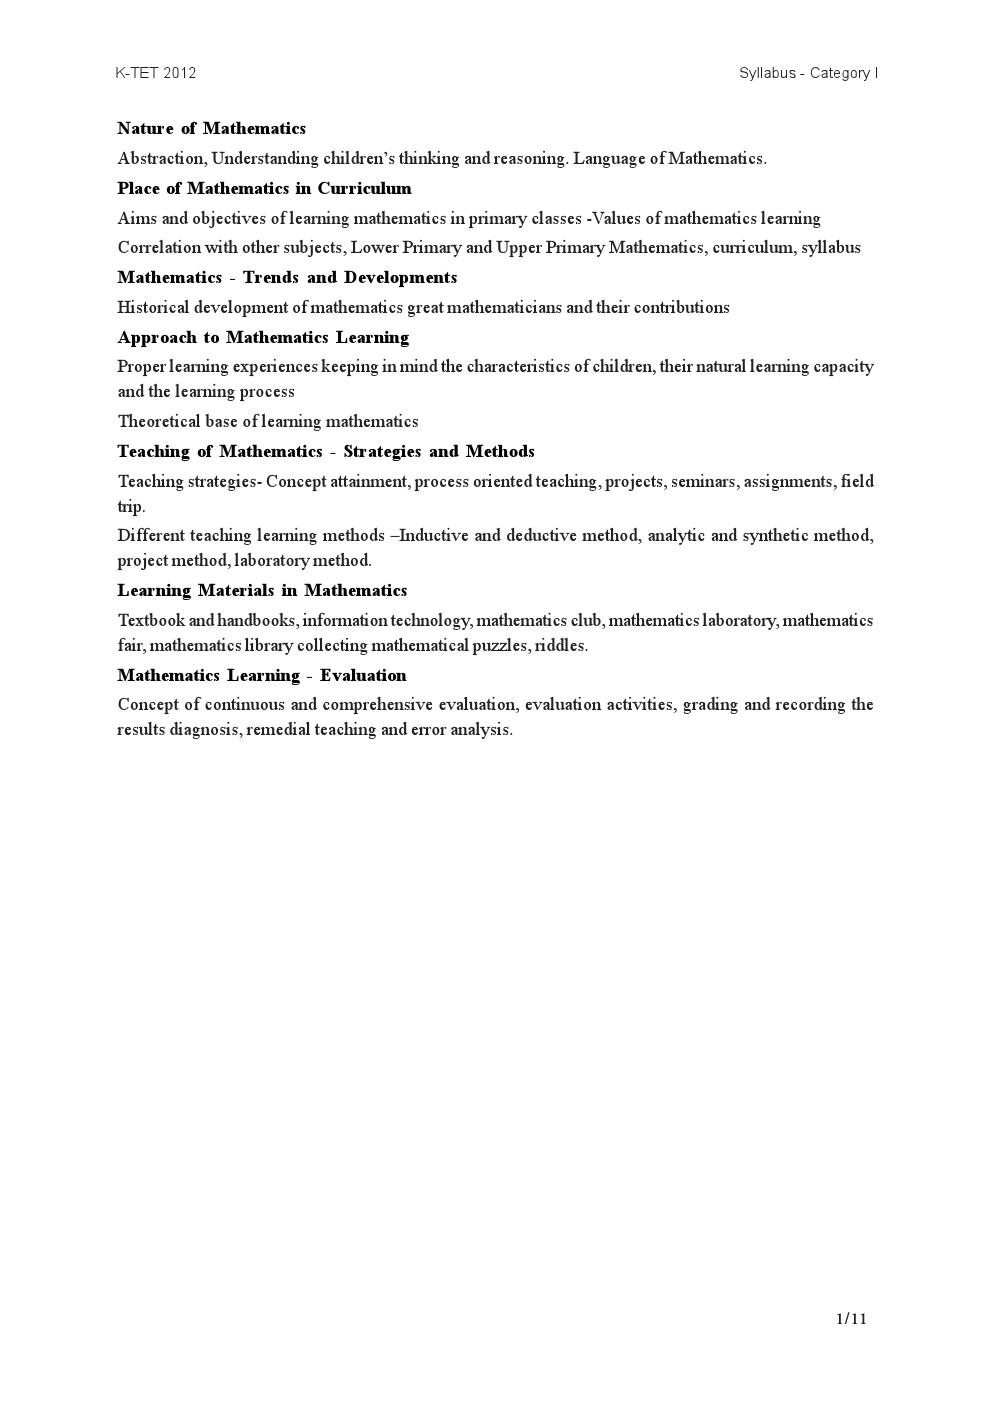 http://masterstudy.net/pdf/syllabus10011.jpg